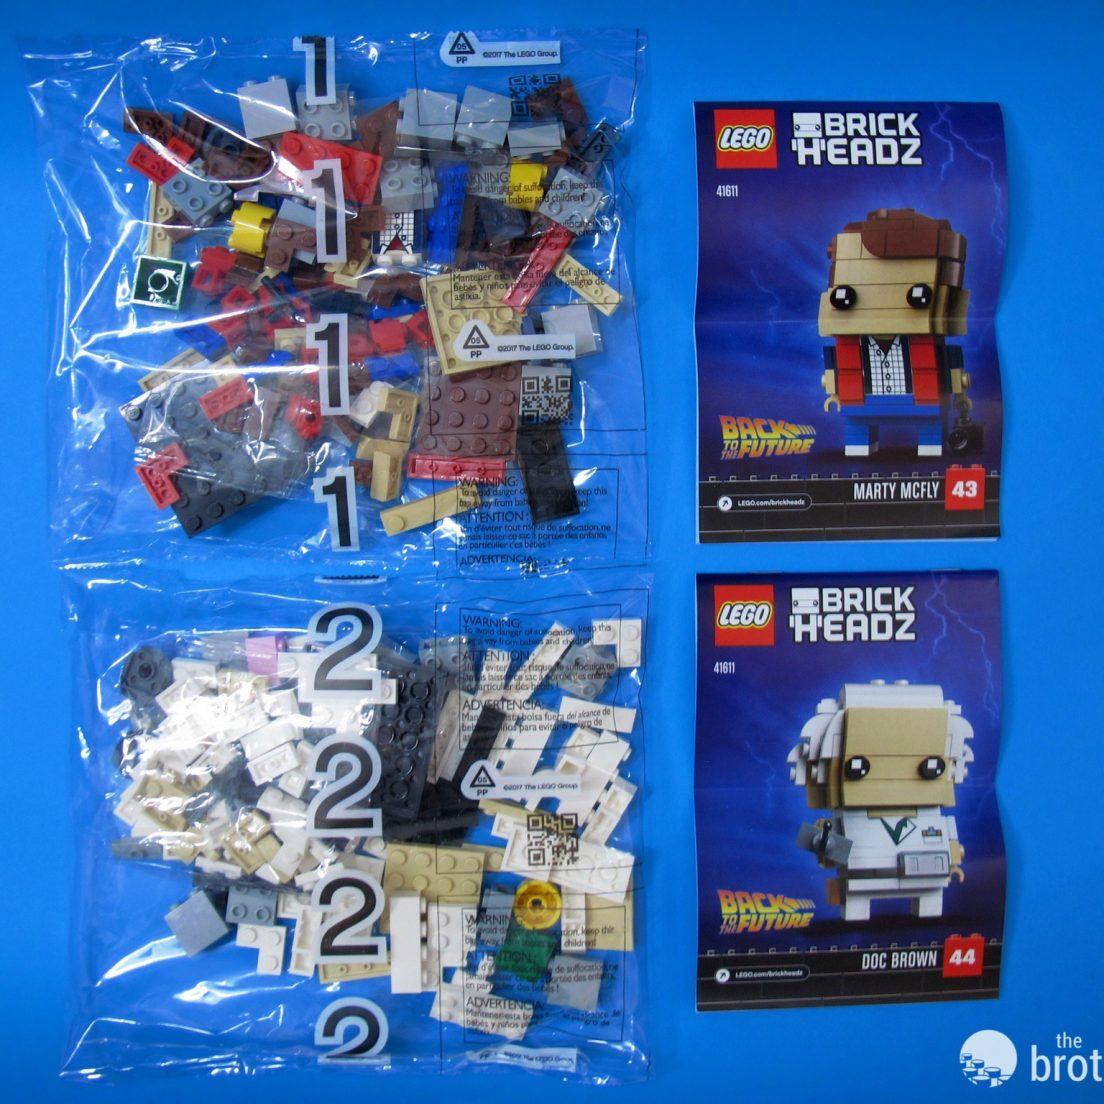 41611 Back To the Future BrickHeadz Box Contents